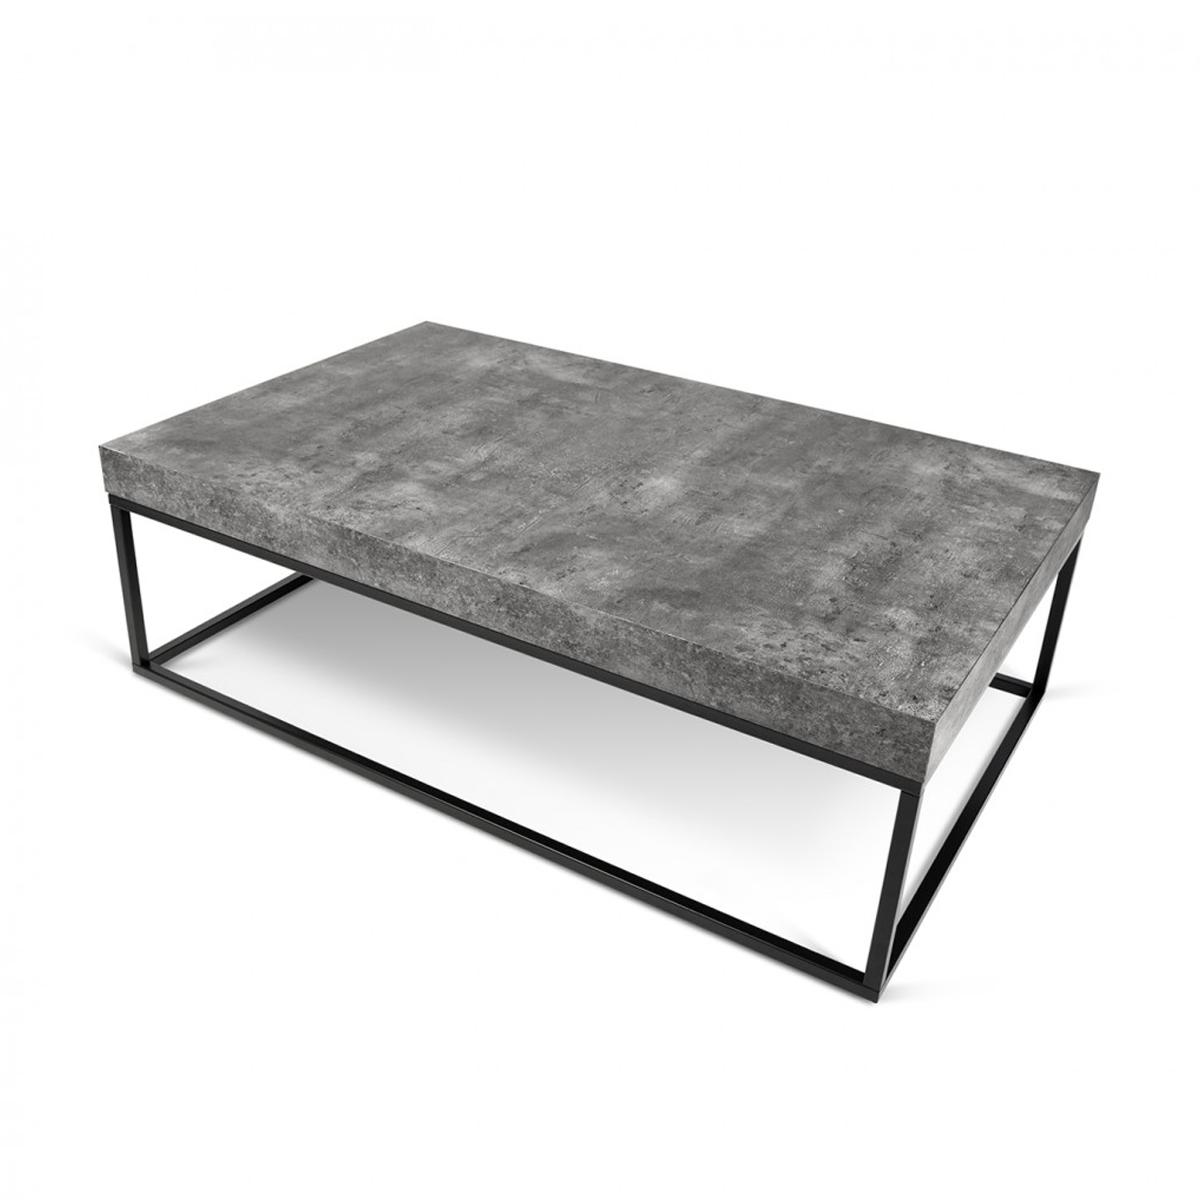 Betonlook salontafel 120 cm